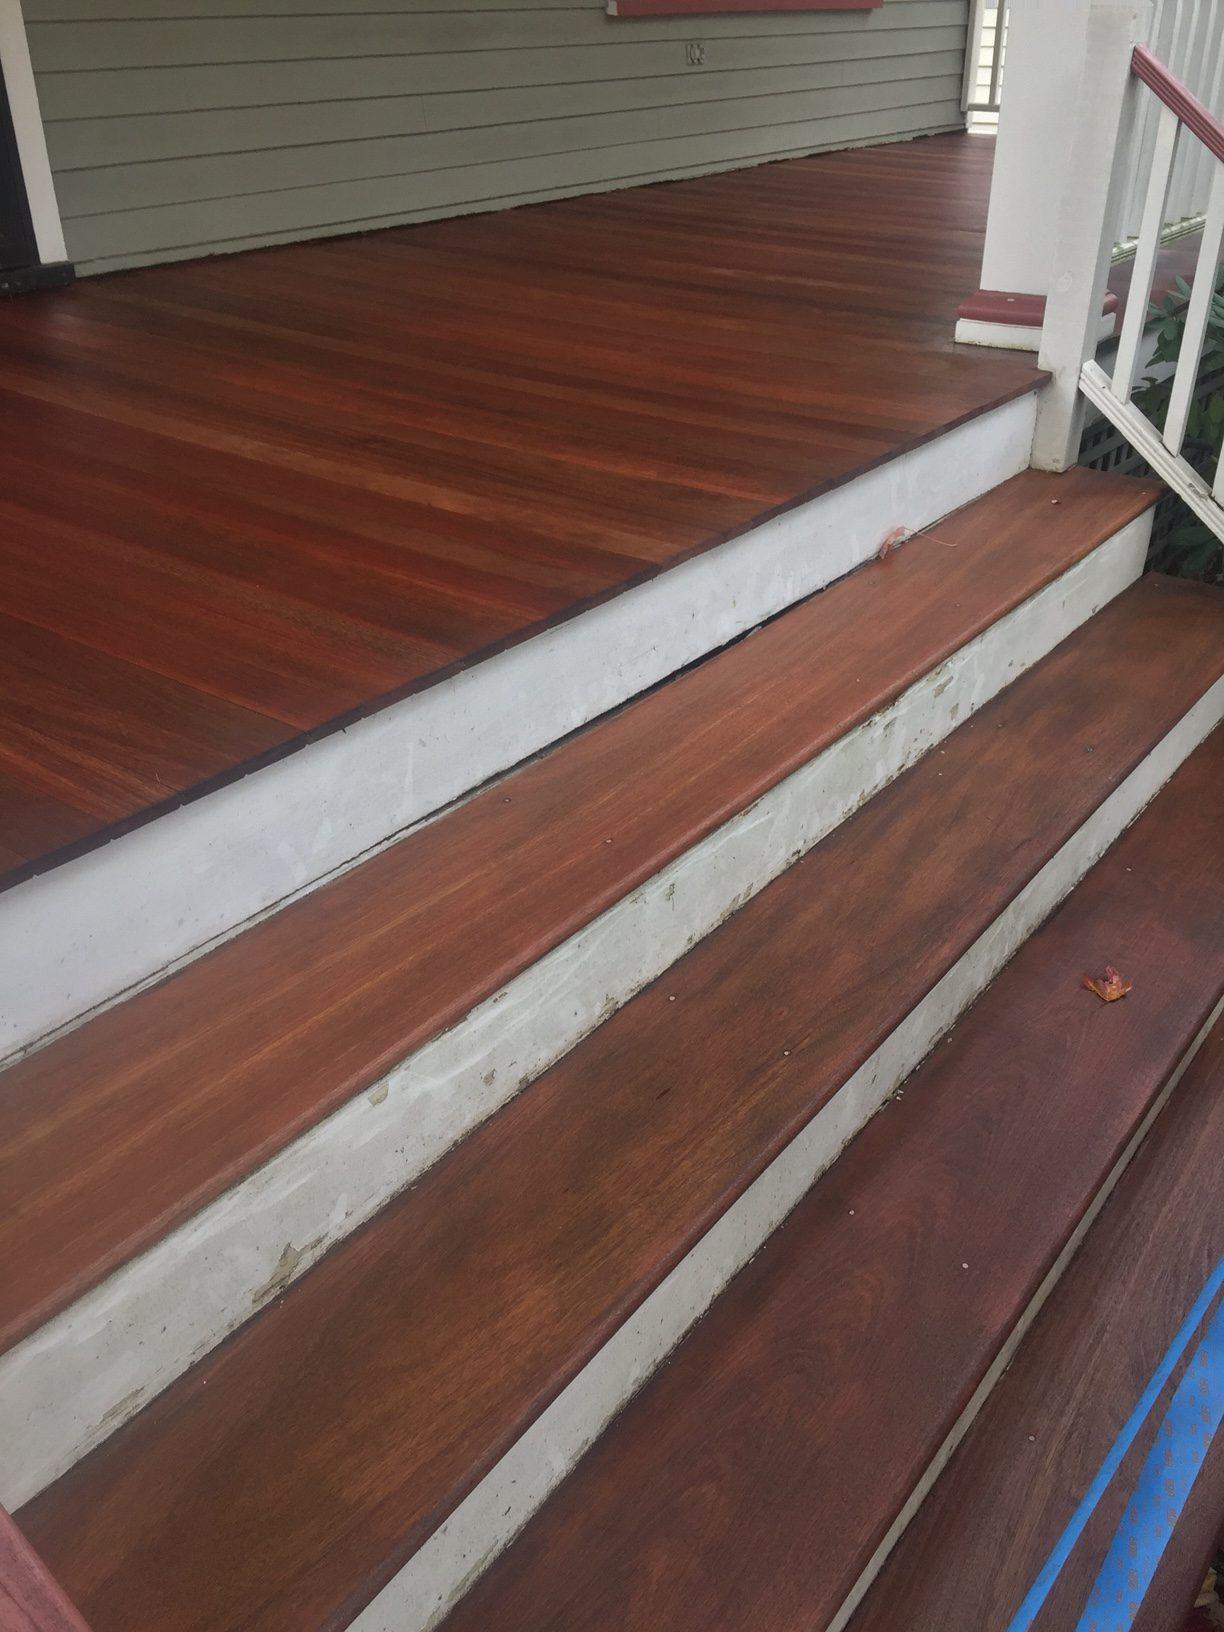 Rubio Monocoat Pure Exterior Wide Plank Mahogany Deck